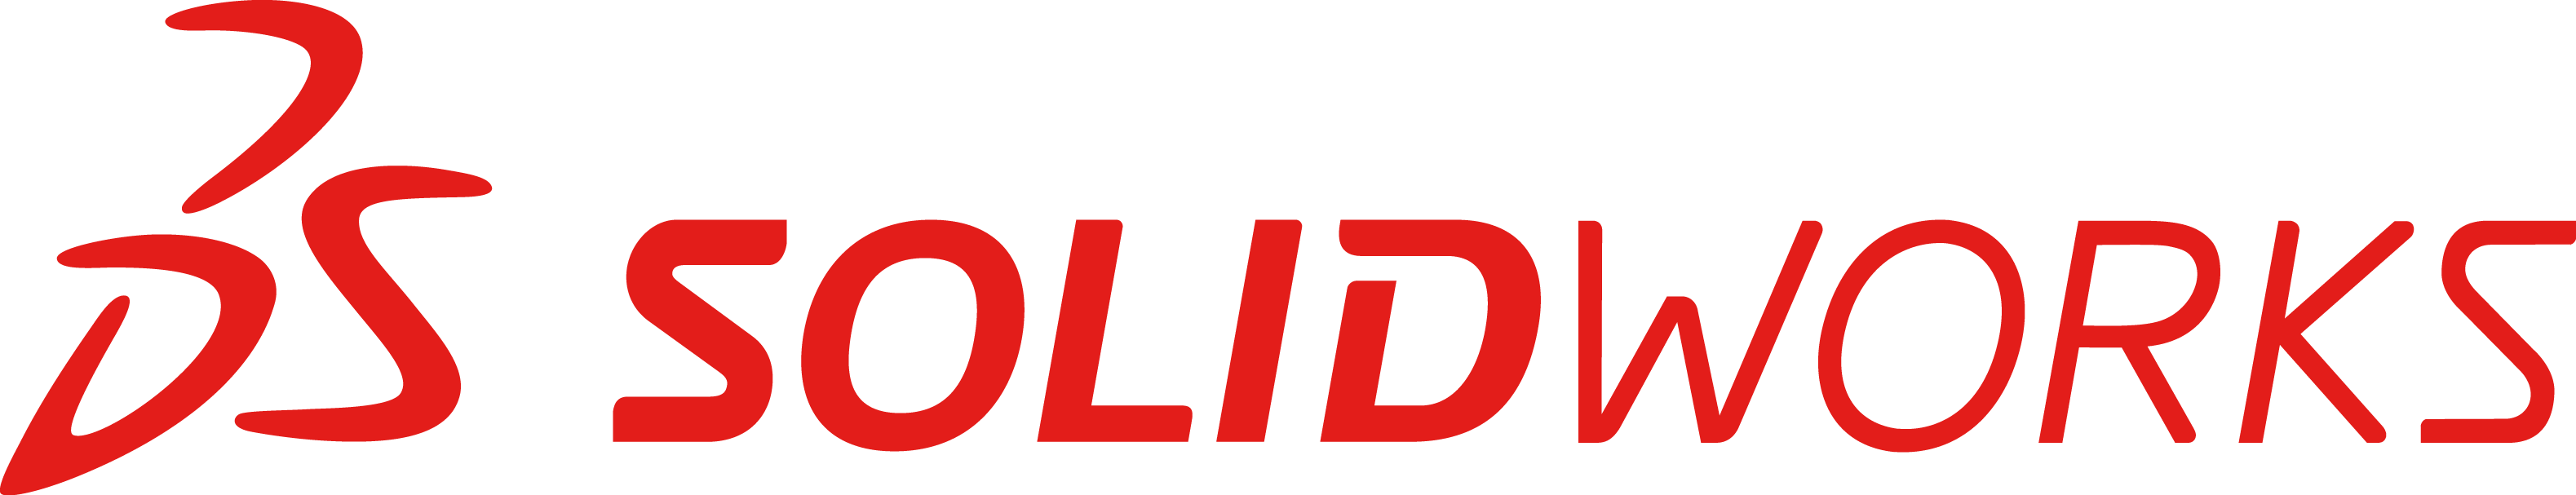 SolidWorks Logo Download Vector.